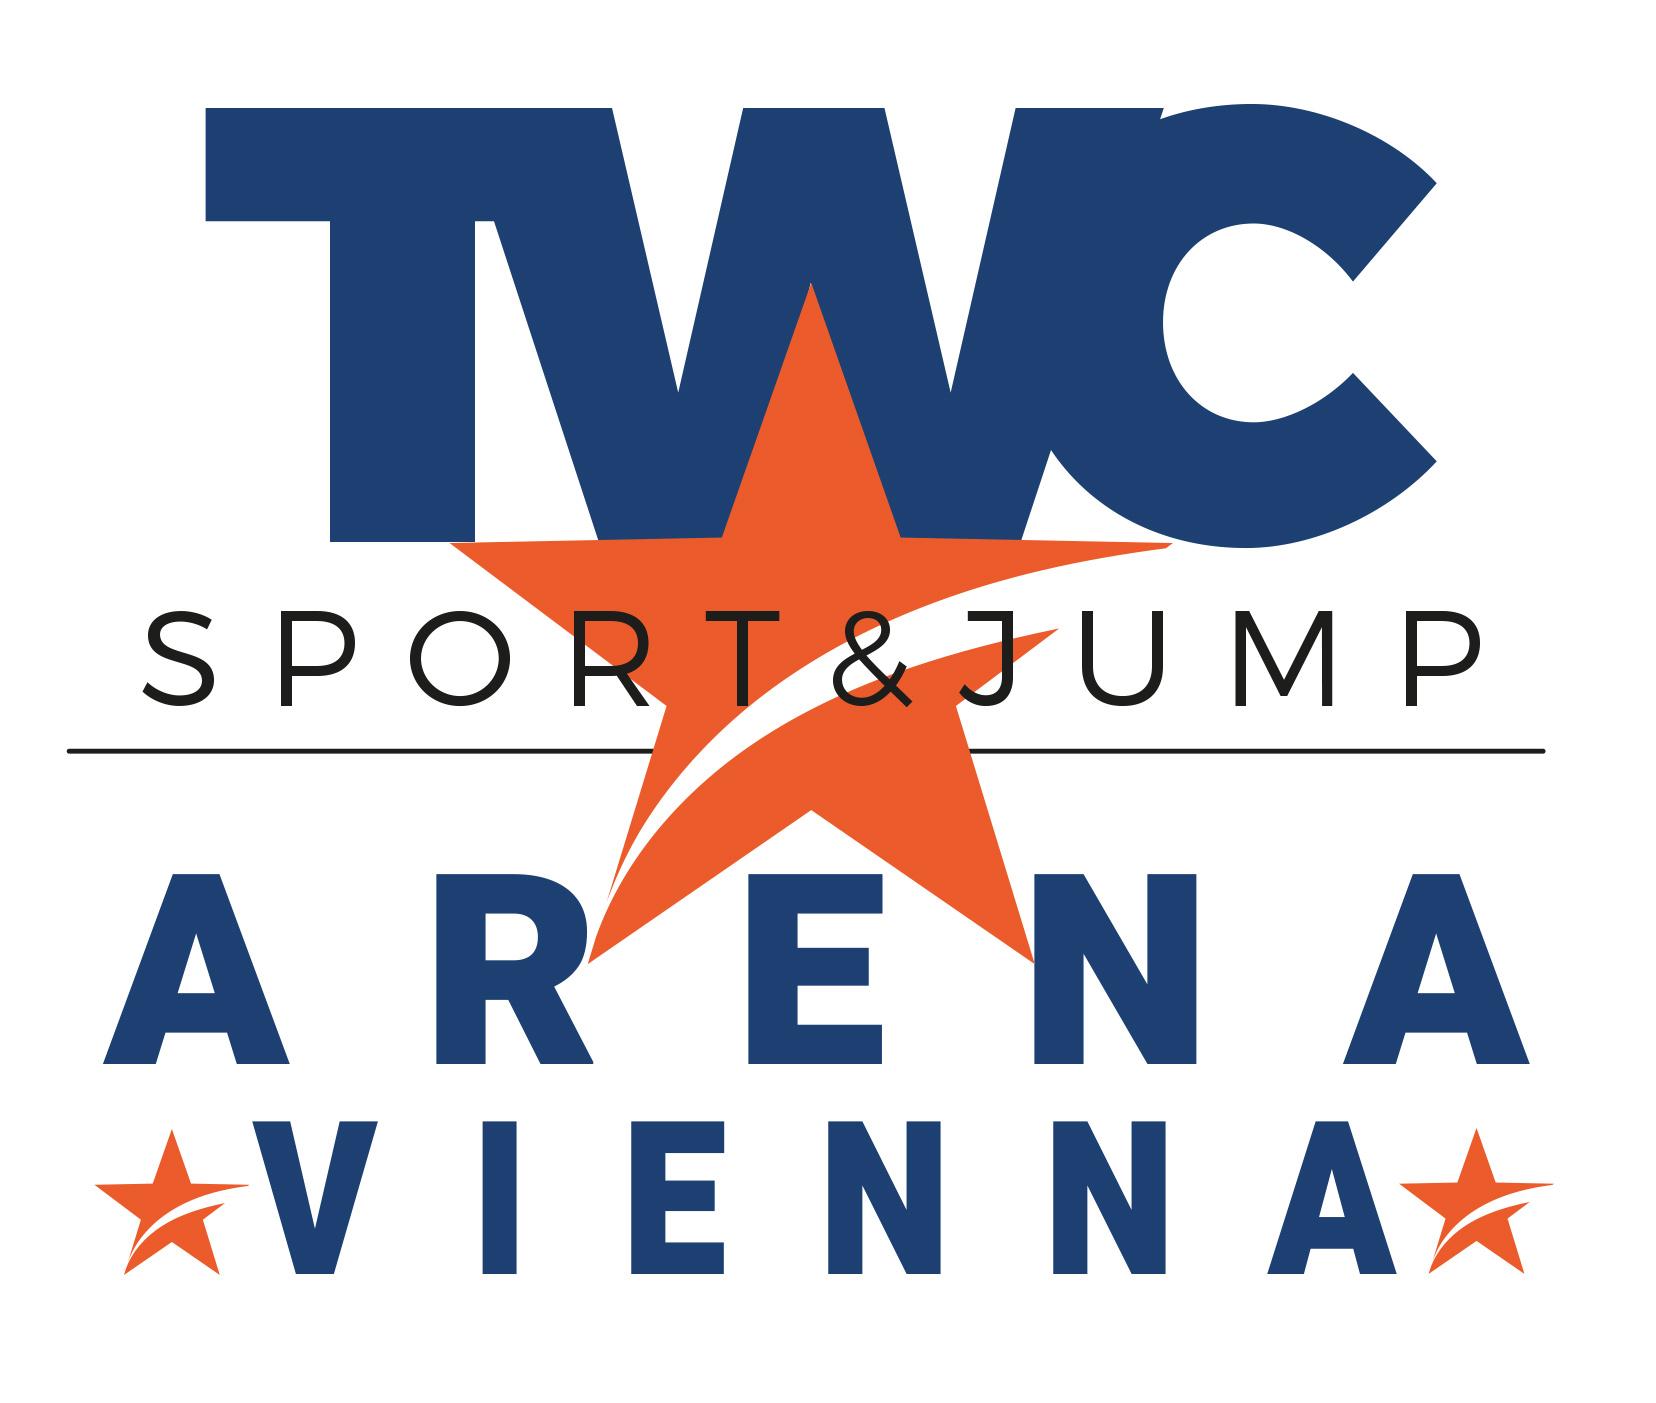 TWC Jump Arena